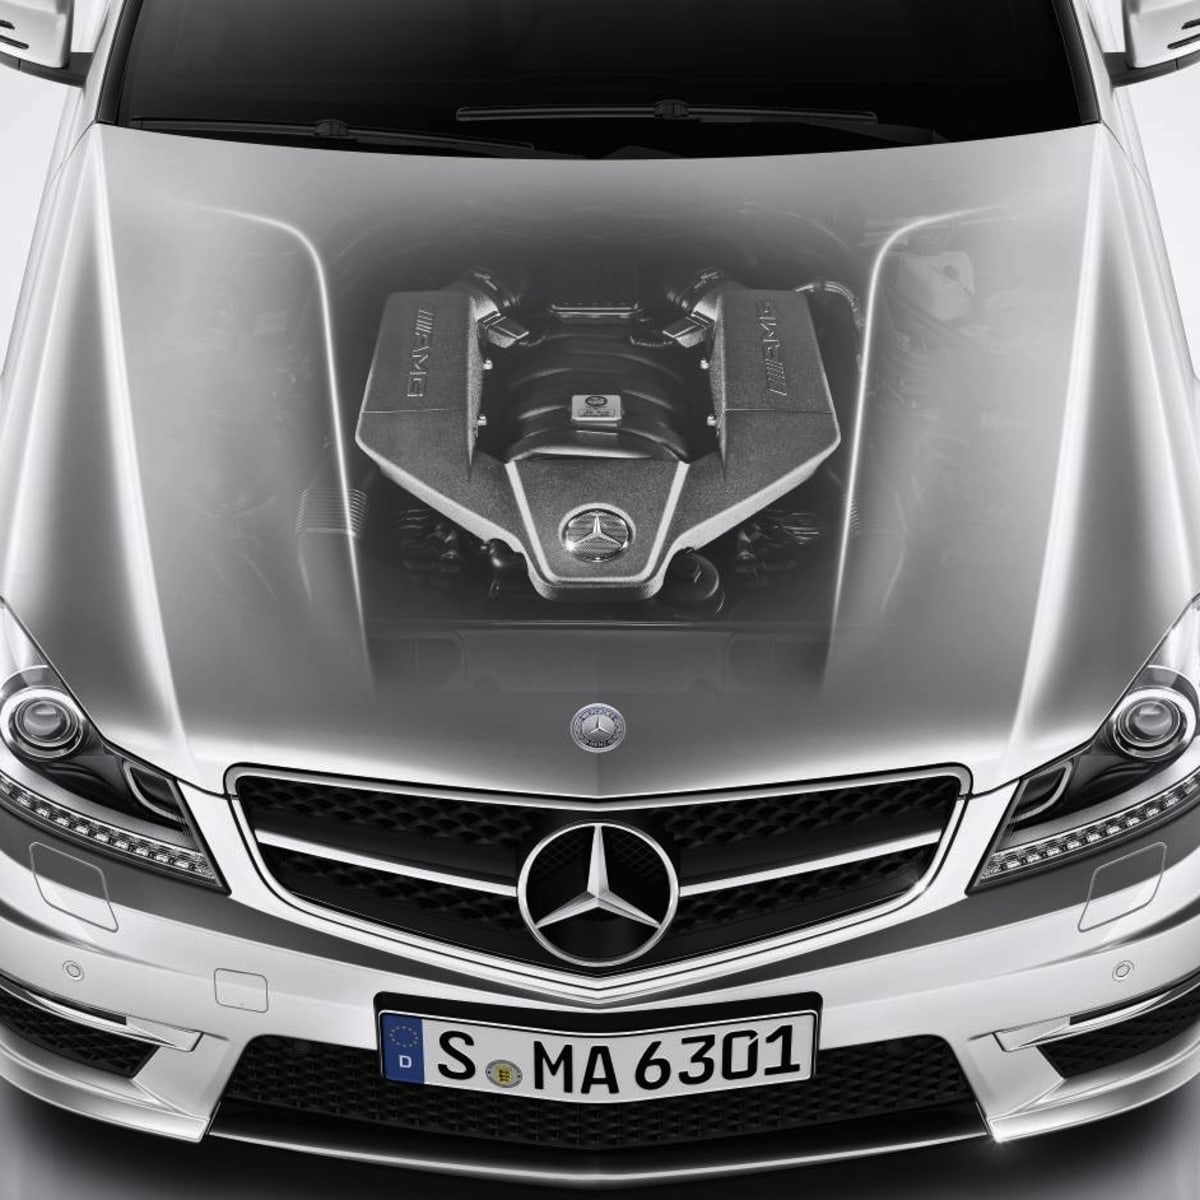 Mercedes-Benz AMG 6 2 M156 V8 engine facing lawsuit over possible